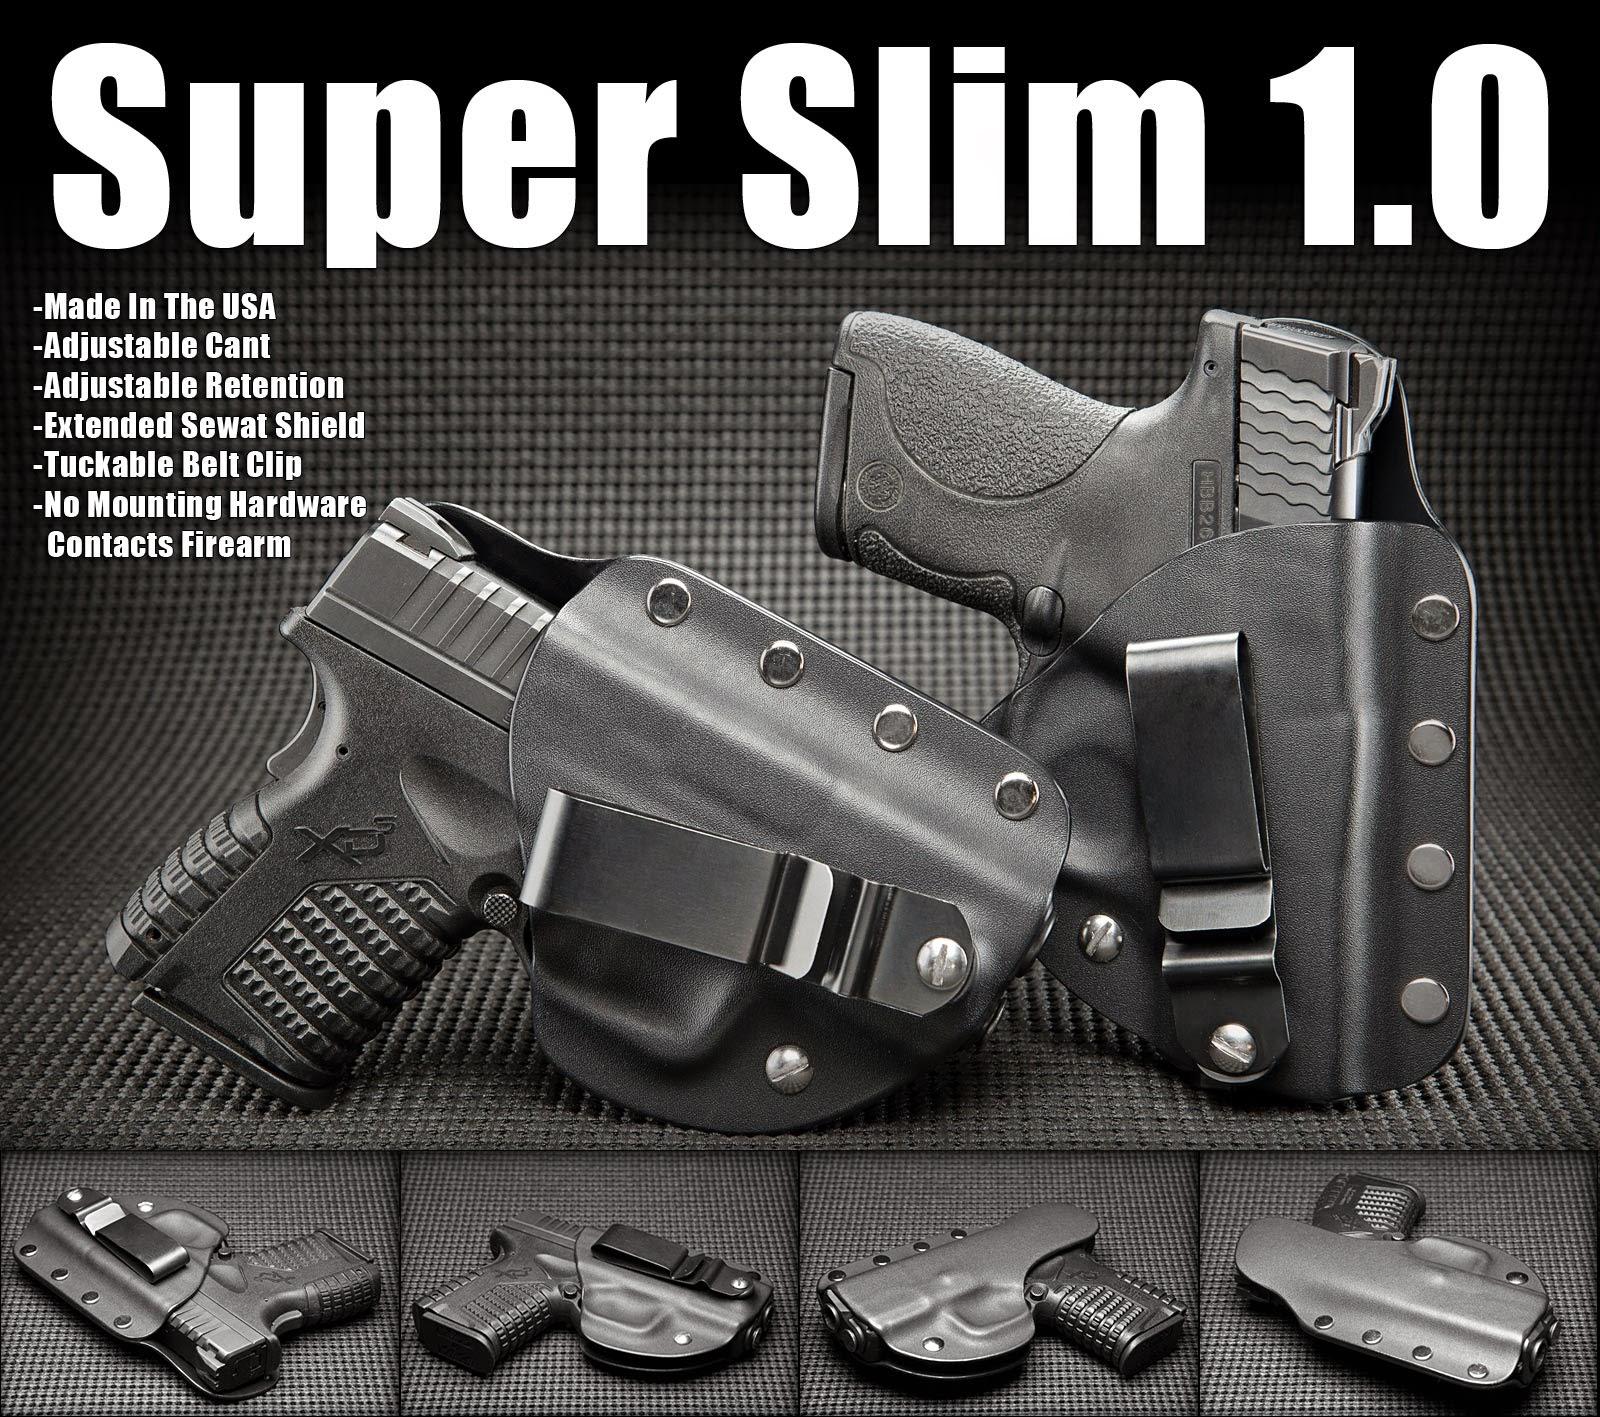 """Firearm"" ""1911 Sub-Compact, 3 Inch Barrel (no rail)"" ""1911 Commander, 4 Inch Barrel (no rail)"" ""1911 Full Size, 5 Inch Barrel (no rail)"" ""Beretta Nano""  ""Beretta PX4 Storm 9 & 40"" ""Beretta Tomcat 32ACP"" ""CZ 75 Compact (no rail)"" ""FNS 9&40"" ""FNX 9&40"" ""Glock 26,27,33"" ""Glock 36"" ""Glock 19,23,32"" ""Glock 17,22,31"" ""GLOCK 30s"" ""Glock 42"" ""H&K P30"" ""KAHR PM9"" ""KAHR PM9 W/CT"" ""KIMBER SOLO"" ""Ruger SR22"" ""RUGER SR9c"" ""Ruger SR40"" ""Ruger SR40c"" ""Ruger LCP"" ""Ruger LC9"" ""SIG P225"" ""SIG P226 W/RAILS"" ""SIG P229 W/RAILS"" ""SIG P238"" ""SIG P290"" ""SIG P938"" ""S&W Bodyguard 380"" ""S&W M&P Compact, 9,40"" ""S&W M&P Full Size 45"" ""S&W Shield 9 & 40"" ""S&W Shield 9 & 40 with LaserMax (+9.95)"" ""SPRINGFIELD XD9 & XD40"" ""SPRINGFIELD XDm9 & XDm40"" ""SPRINGFIELD XDm 3.8 40"" ""SPRINGFIELD XDs3.3, 9 & 45"" ""TAURUS MILLENNIUM PRO140"" ""Taurus PT111, PT140"" ""**************************************************"" ""* * * Long-Lead Items 3-4 Week Turn Around * * *"" ""Beretta 92D Centurion (+19.95)*"" ""Beretta Cougar(+19.95)*"" ""Beretta M9/92F(+19.95)"" ""Beretta 90 TWO(+19.95)*"" ""Beretta PX4 Storm 45ACP(+19.95)*"" ""Beretta Vertec(+19.95)*"" ""Bersa Thunder 380(+19.95)*"" ""Bersa Thunder 45(+19.95)*"" ""Browning Hi-Power(+19.95)*"" ""CZ 75(+19.95)*"" ""CZ 75 Phantom(+19.95)*"" ""CZ 75 P-07(+19.95)*"" ""Diamondback DB380 (19.95)*"" ""FNH Five-Seven(+19.95)*"" ""FNX45 TACTICAL (+19.95)*"" ""GLOCK 17/22/31 w/M3 (+19.95)*"" ""GLOCK 17/22/31 w/M5 (+19.95)*"" ""GLOCK 17/22/31 w/Glock Light (+19.95)*"" ""GLOCK 17/22/31 w/TLR1 (+19.95)*"" ""GLOCK 19/23/32 w/M5 (+19.95)*"" ""GLOCK 20,21 (+19.95)*"" ""GLOCK 21SF (+19.95)*"" ""GLOCK 30(+19.95)*"" ""GLOCK 34/35 (+19.95)*"" ""GLOCK 37 (+19.95)*"" ""H&K P2000 Compact (+19.95)*"" ""H&K USP 9MM (+19.95)*"" ""H&K USP 9MM w/X300 (+19.95)*"" ""H&K USP 9MM COMPACT*"" ""H&K USP.45 (+19.95)*"" ""H&K HK45 COMPACT(+19.95)*"" ""H&K MARK 23 SOCOM (+19.95)*"" ""H&K P2000 US Version(+19.95)*"" ""H&K P2000 European Version(+19.95)*"" ""H&K P7M8(+19.95)*"" ""KAHR P380(+19.95)*"" ""KAHR P380 w/CT(+19.95)*"" ""KAHR PM45(+19.95)*"" ""KAHR CW45(+19.95)*"" ""KELTEC P3"